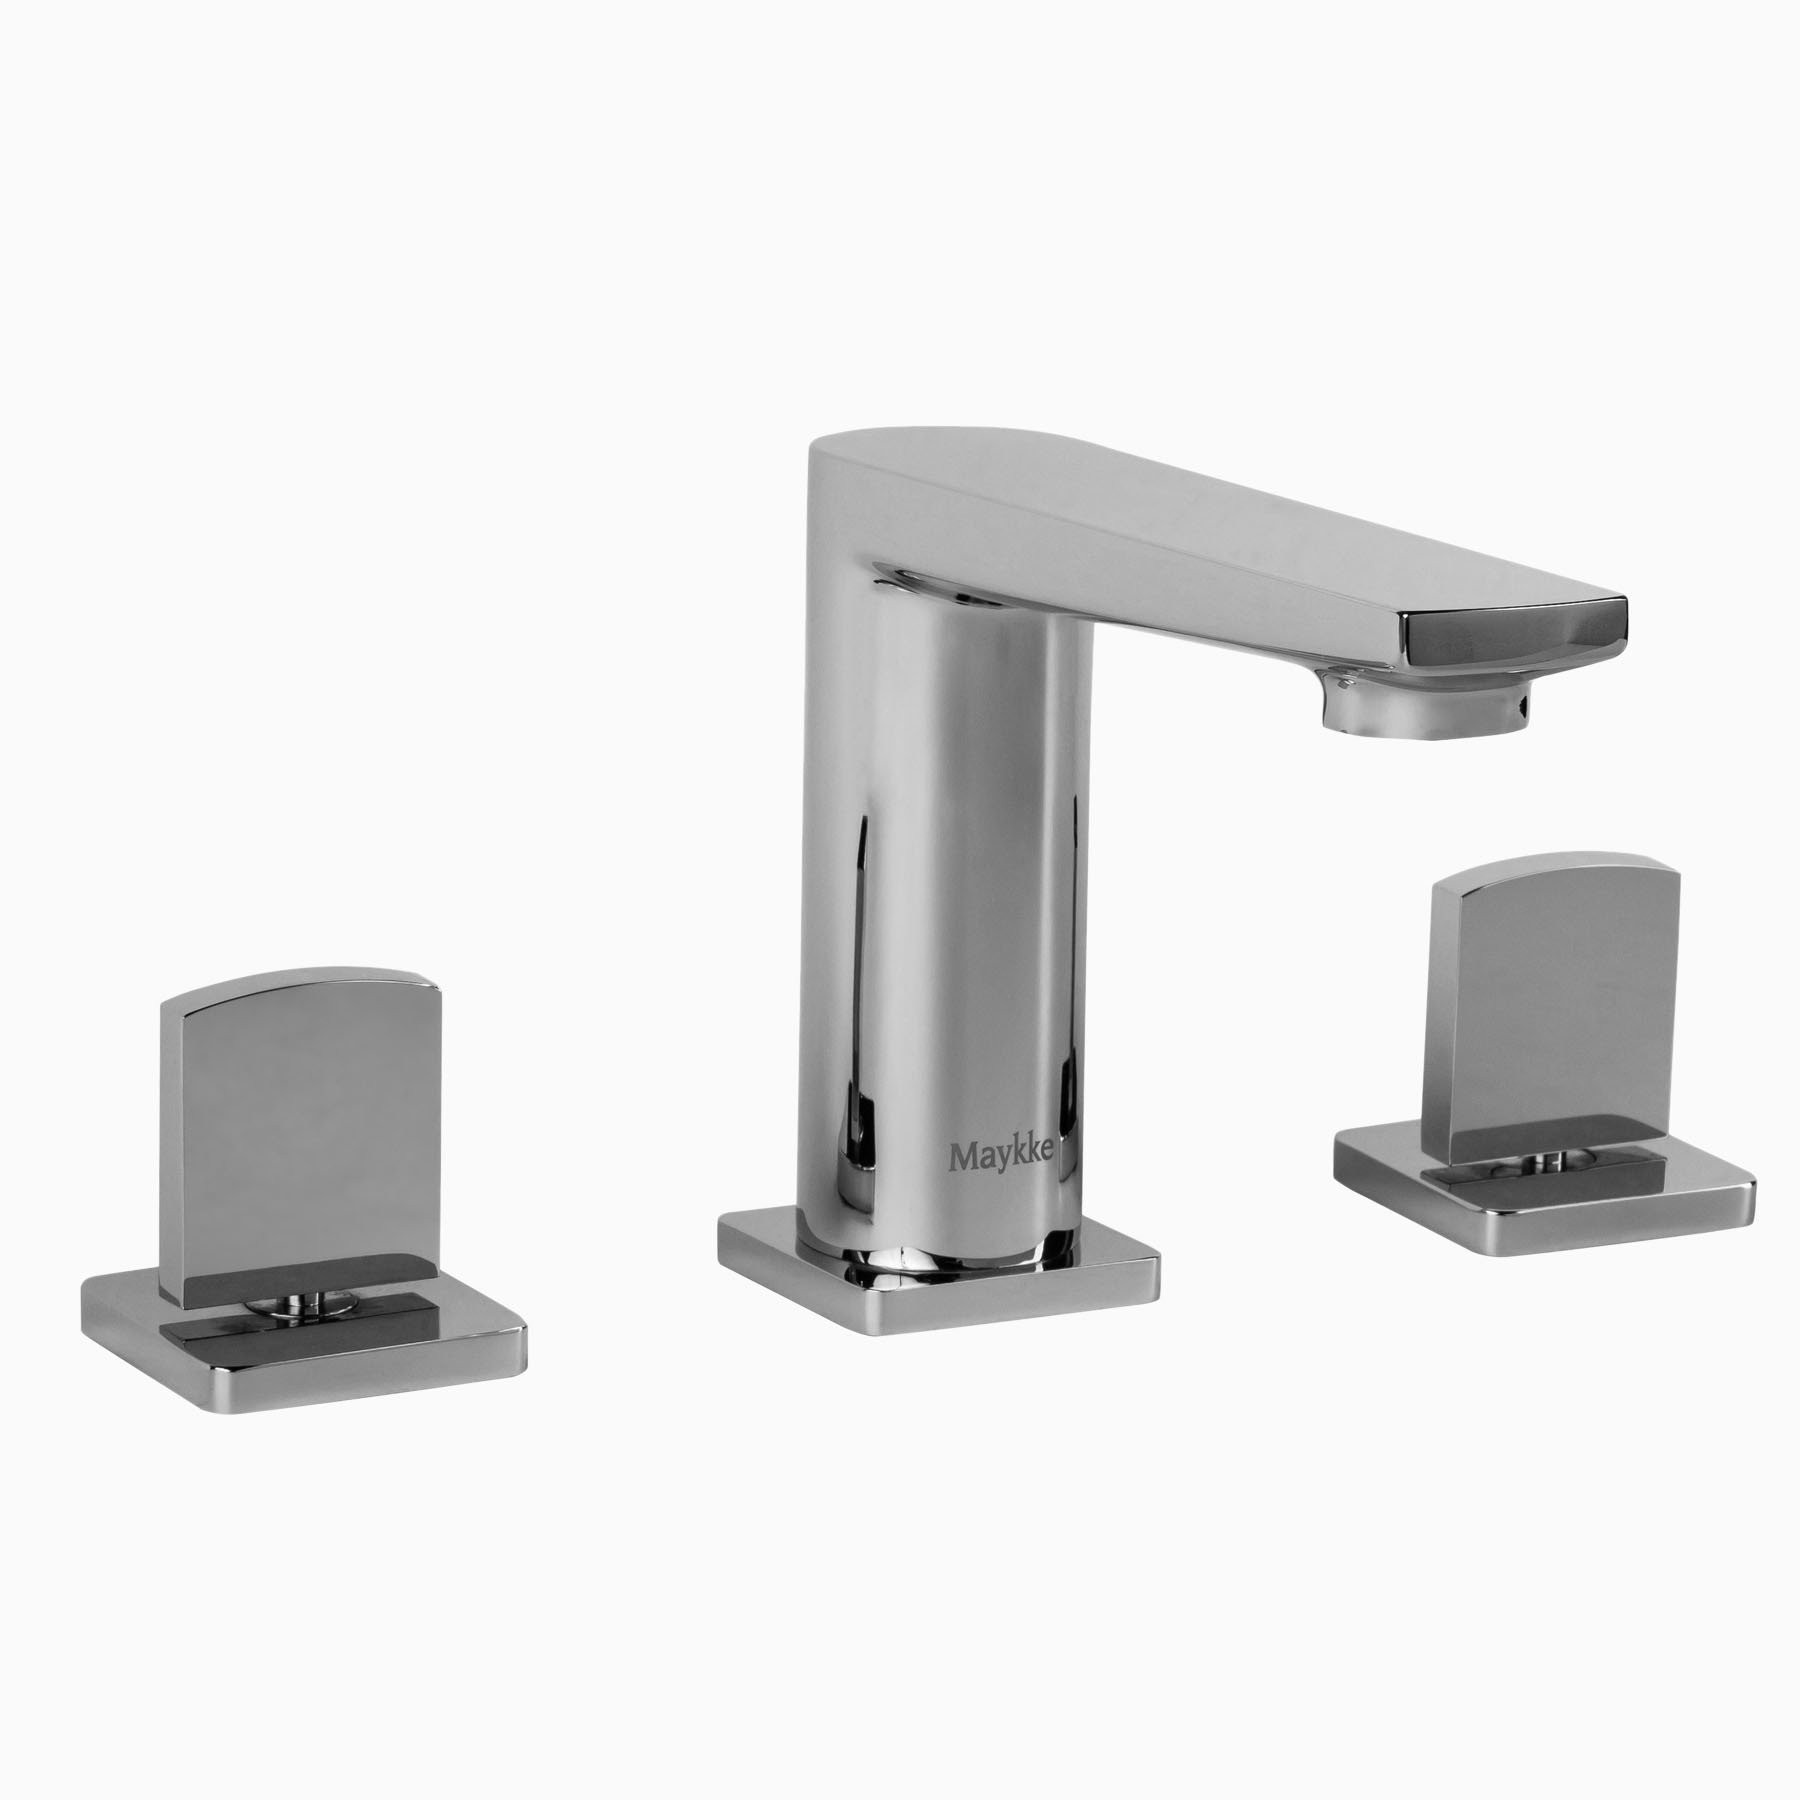 Adalbert Brass Bathroom Sink Faucet, 3 Piece Bathroom Faucet